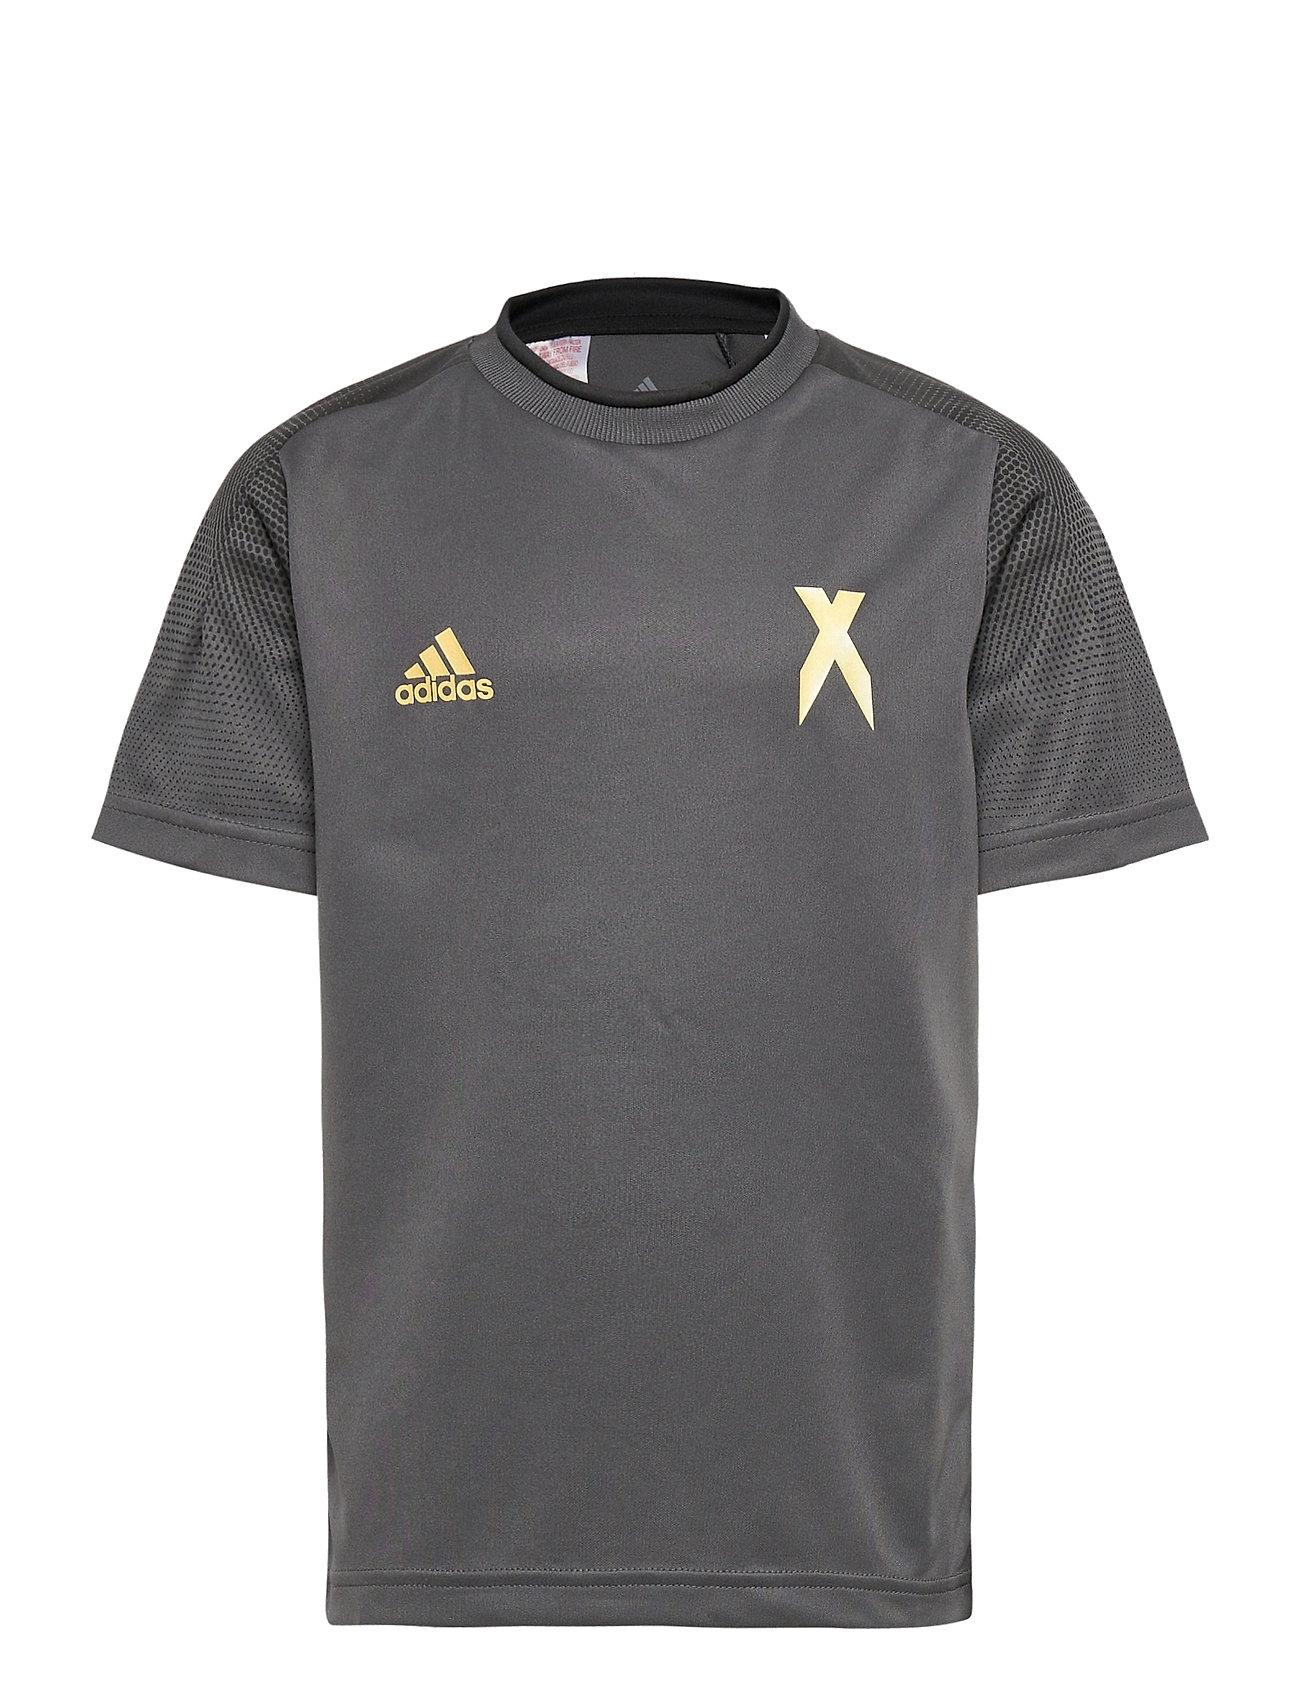 Image of B A.R. X Jsy T-shirt Grå Adidas Performance (3448362829)